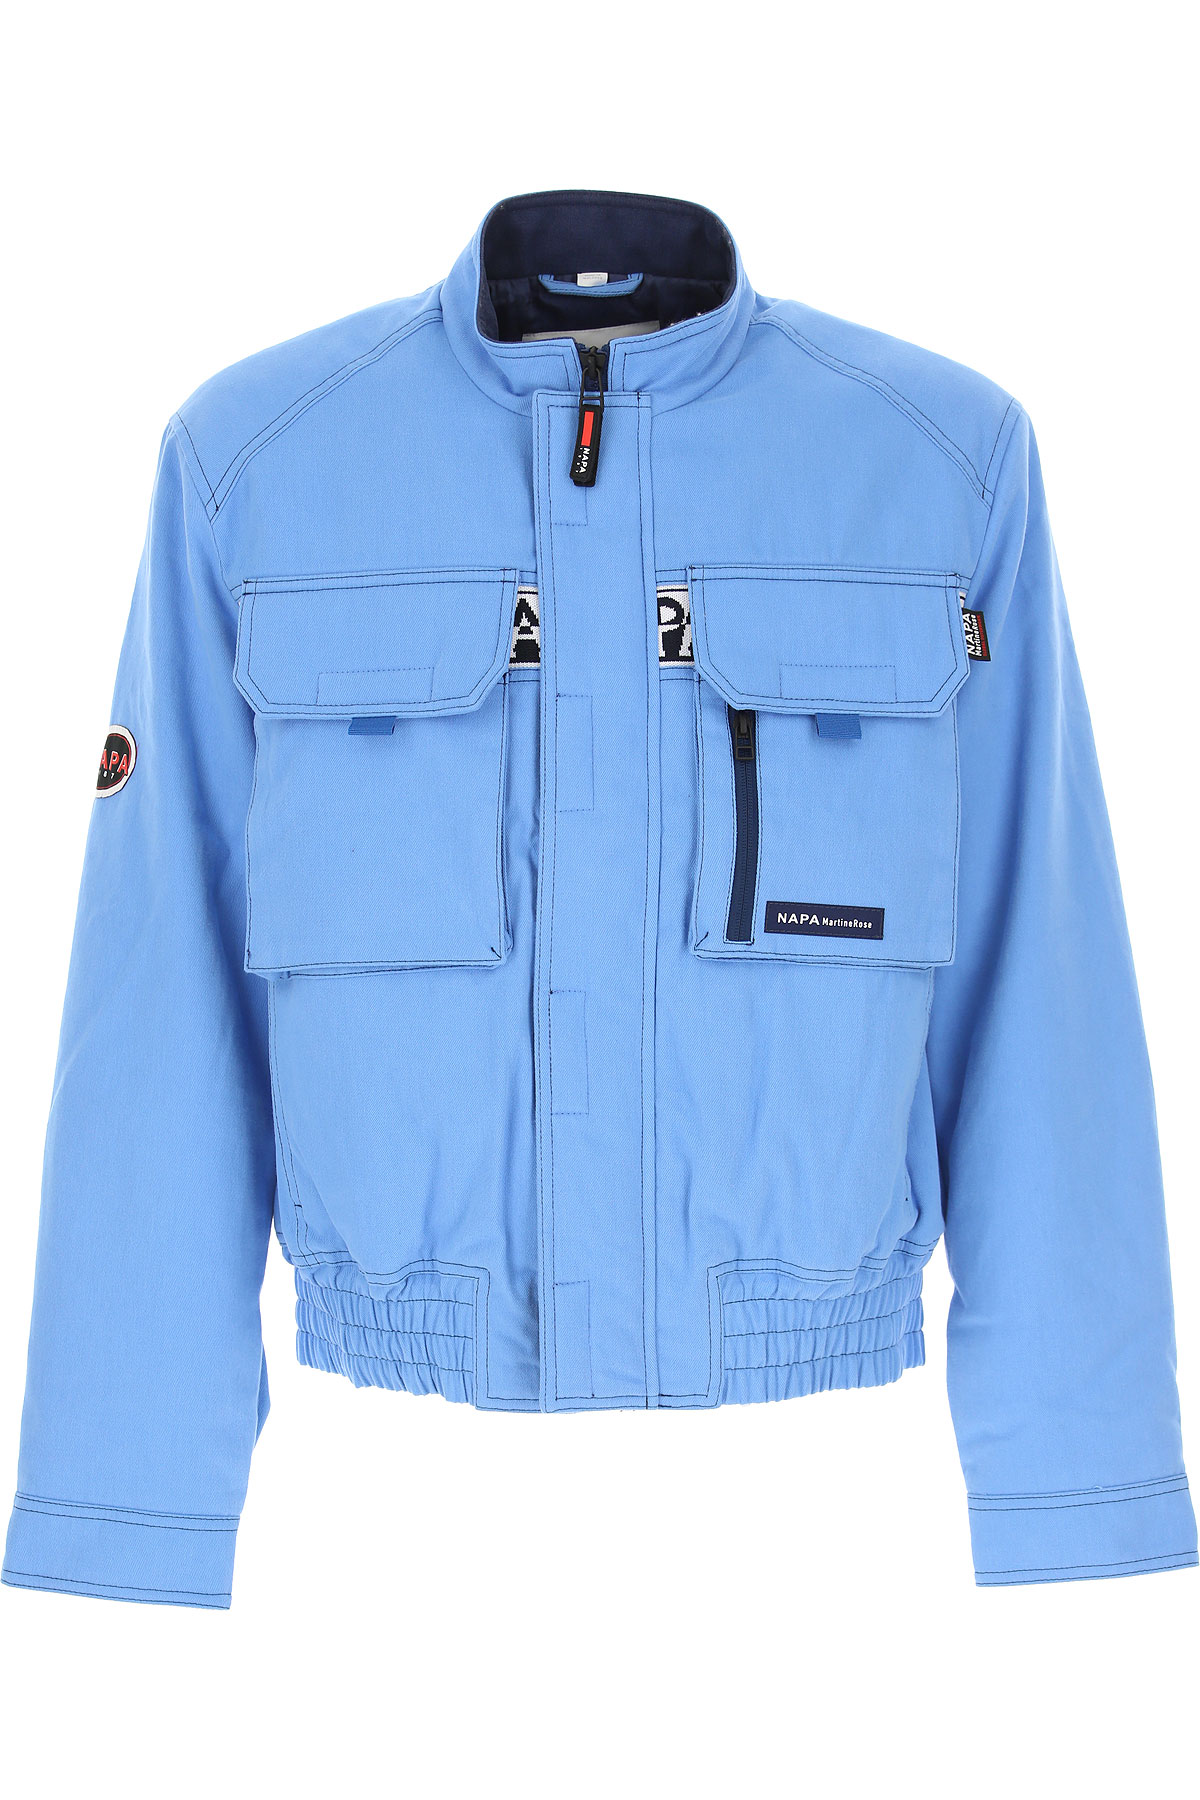 Napapijri Down Jacket for Men, Puffer Ski Jacket On Sale, Sky Blue, Cotton, 2019, L M S